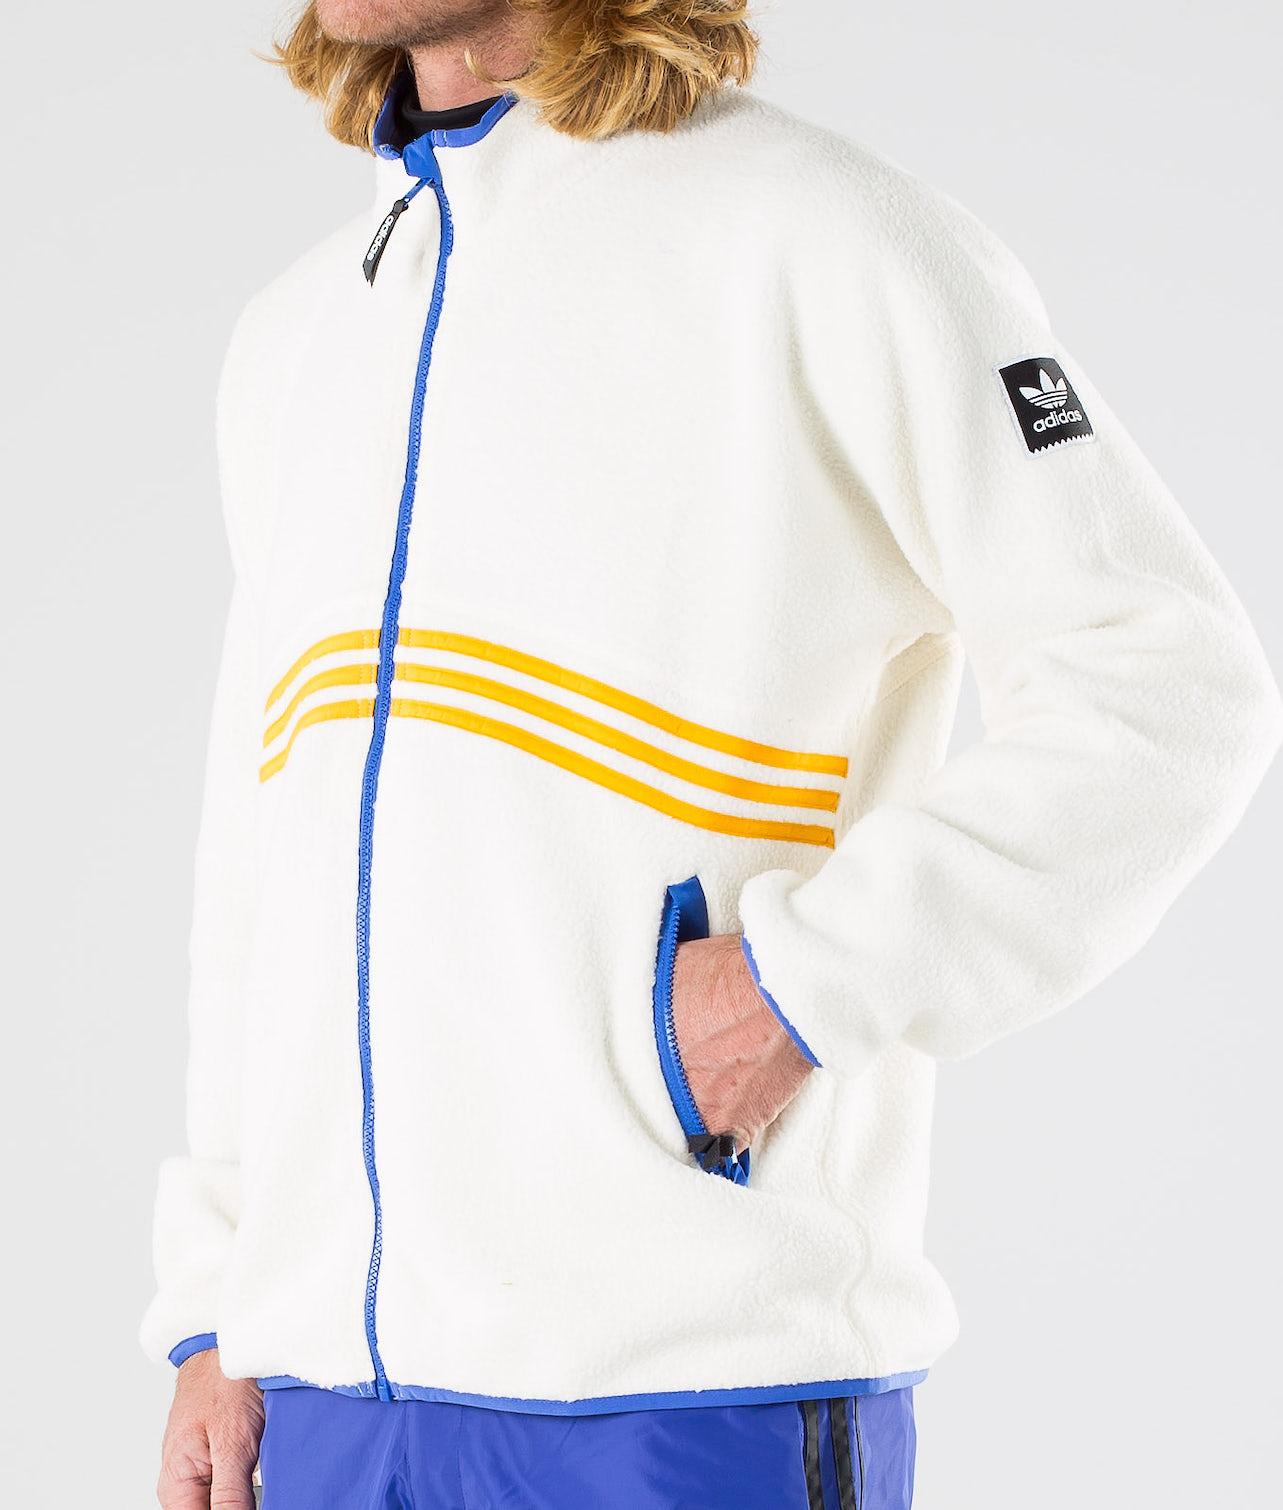 Adidas Skateboarding Sherpa Full Zip Jacka Cream White/Collegiate Orange/Hi-Res Blue S18/Carbon